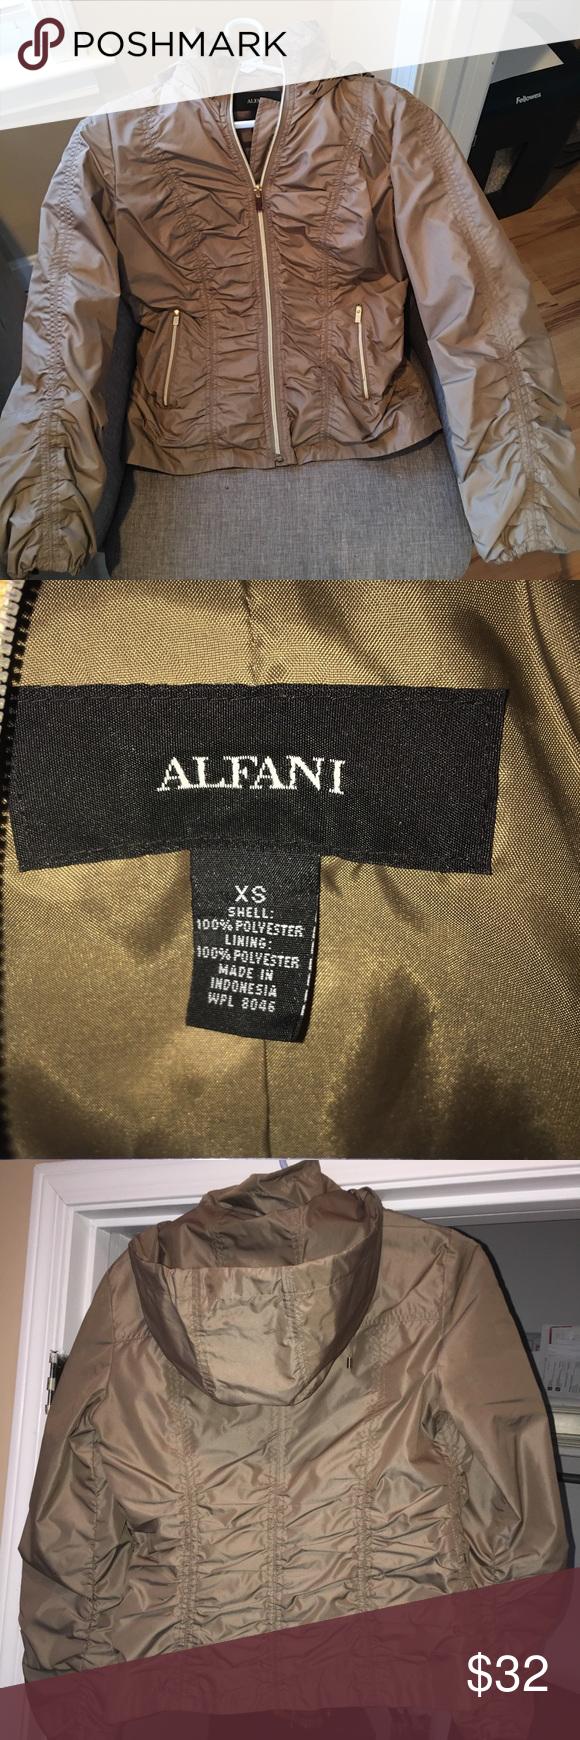 Women's Alfani Lightweight Jacket Womens Size xtra small.   Beautiful Light mocha color with gold hardware.  Removable hood. Like new condition.  Retail $149 Bought at Macy's. Alfani Jackets & Coats